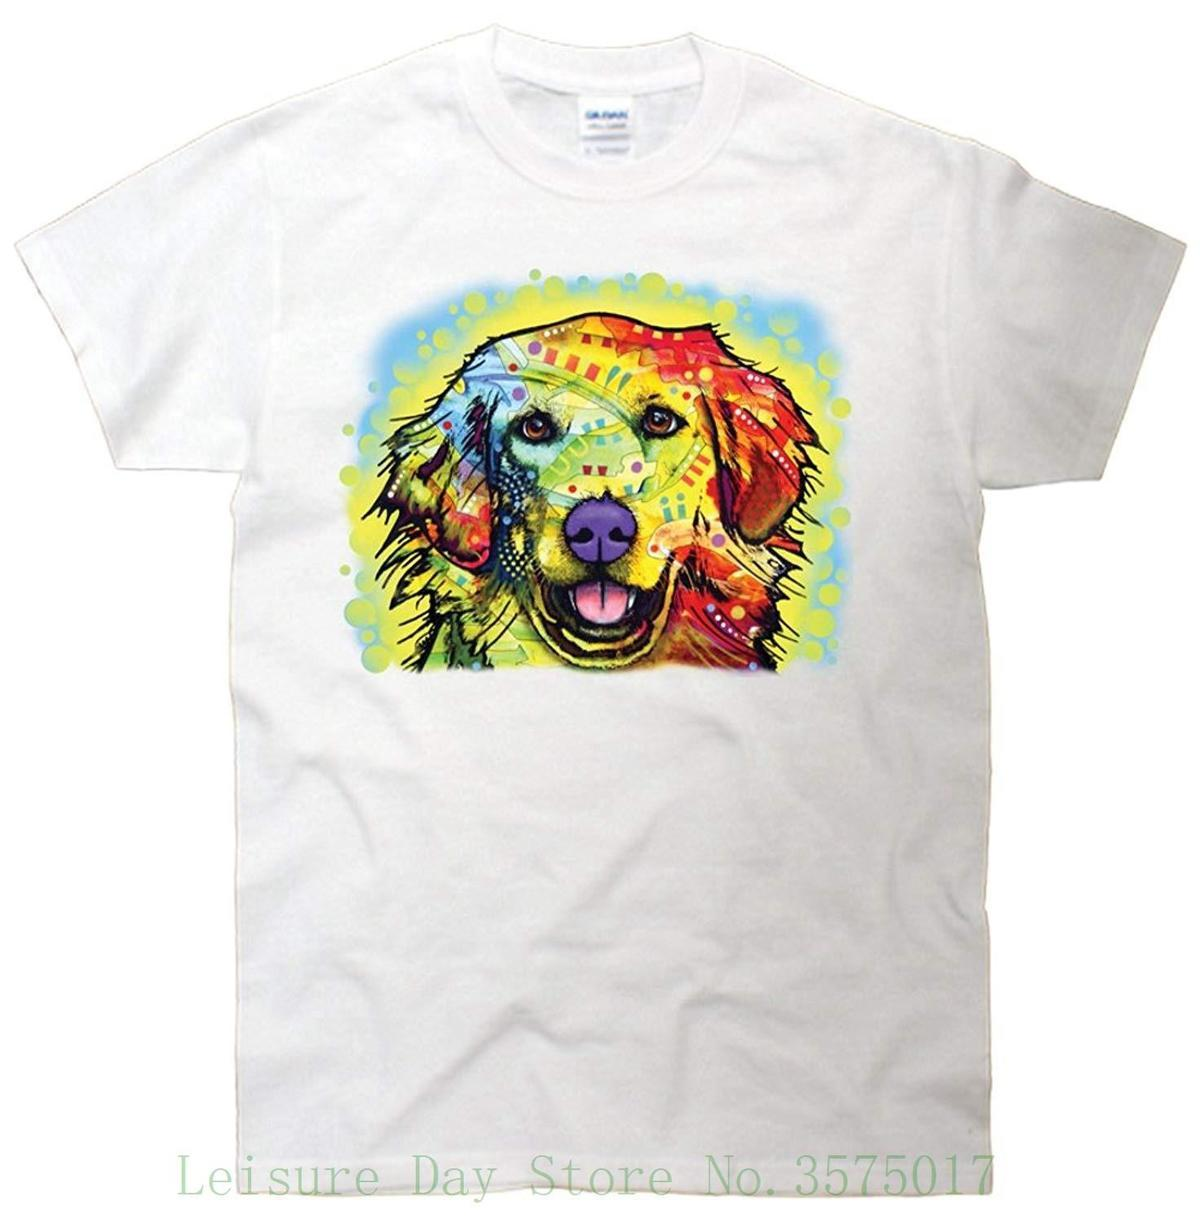 d27985417e Golden Retriever Official Dean Russo T Shirt Quality T Shirts Men Printing  Short Sleeve O Neck Tshirt Funny Slogan T Shirts Cool Shirt Design From  Yuxin0005 ...